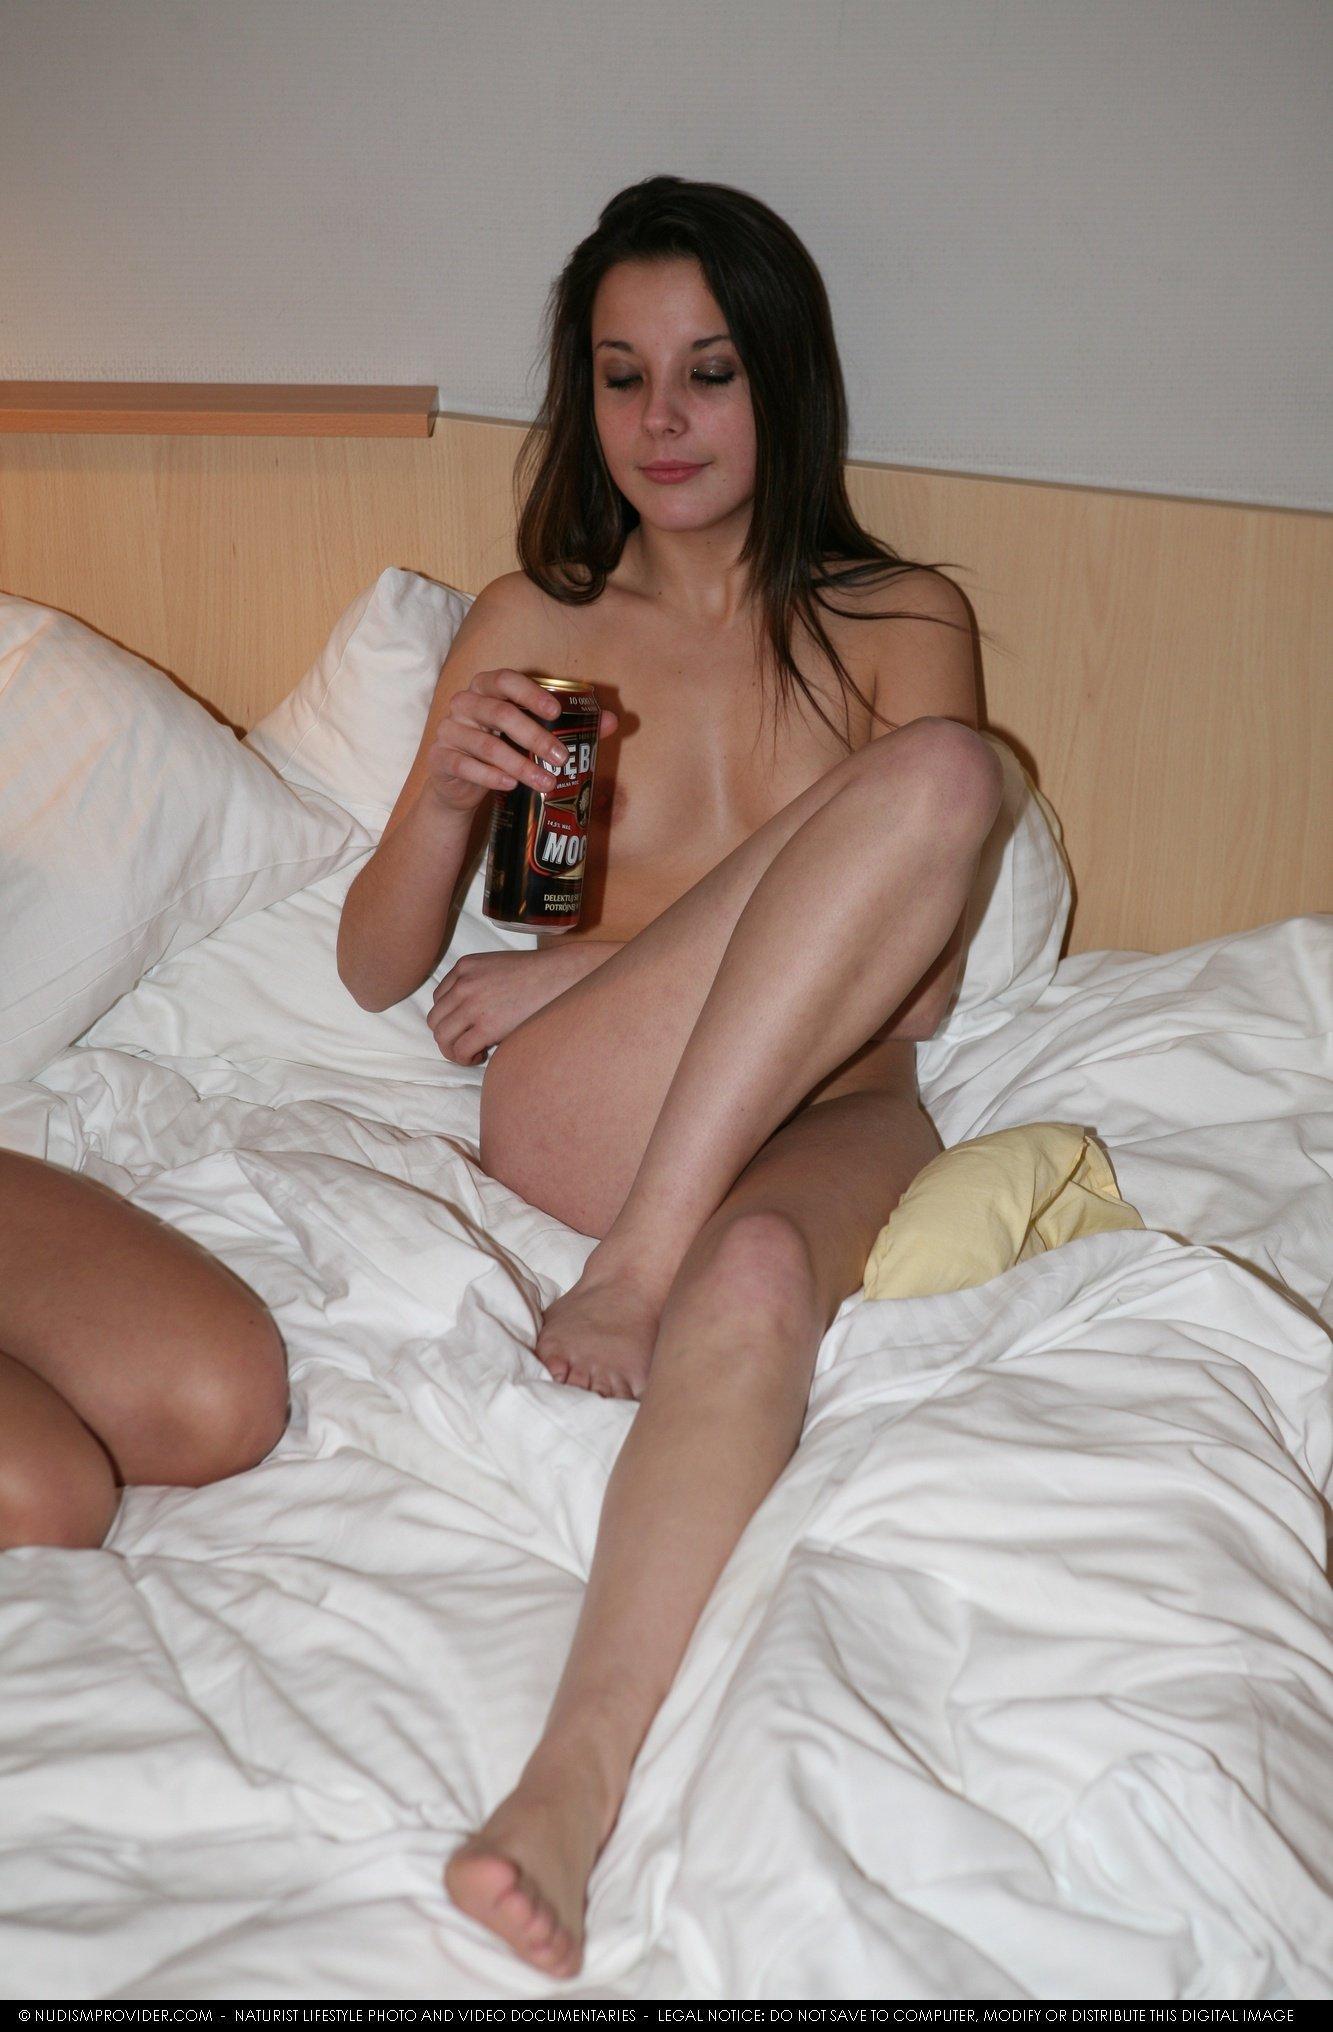 Melanie slade nude